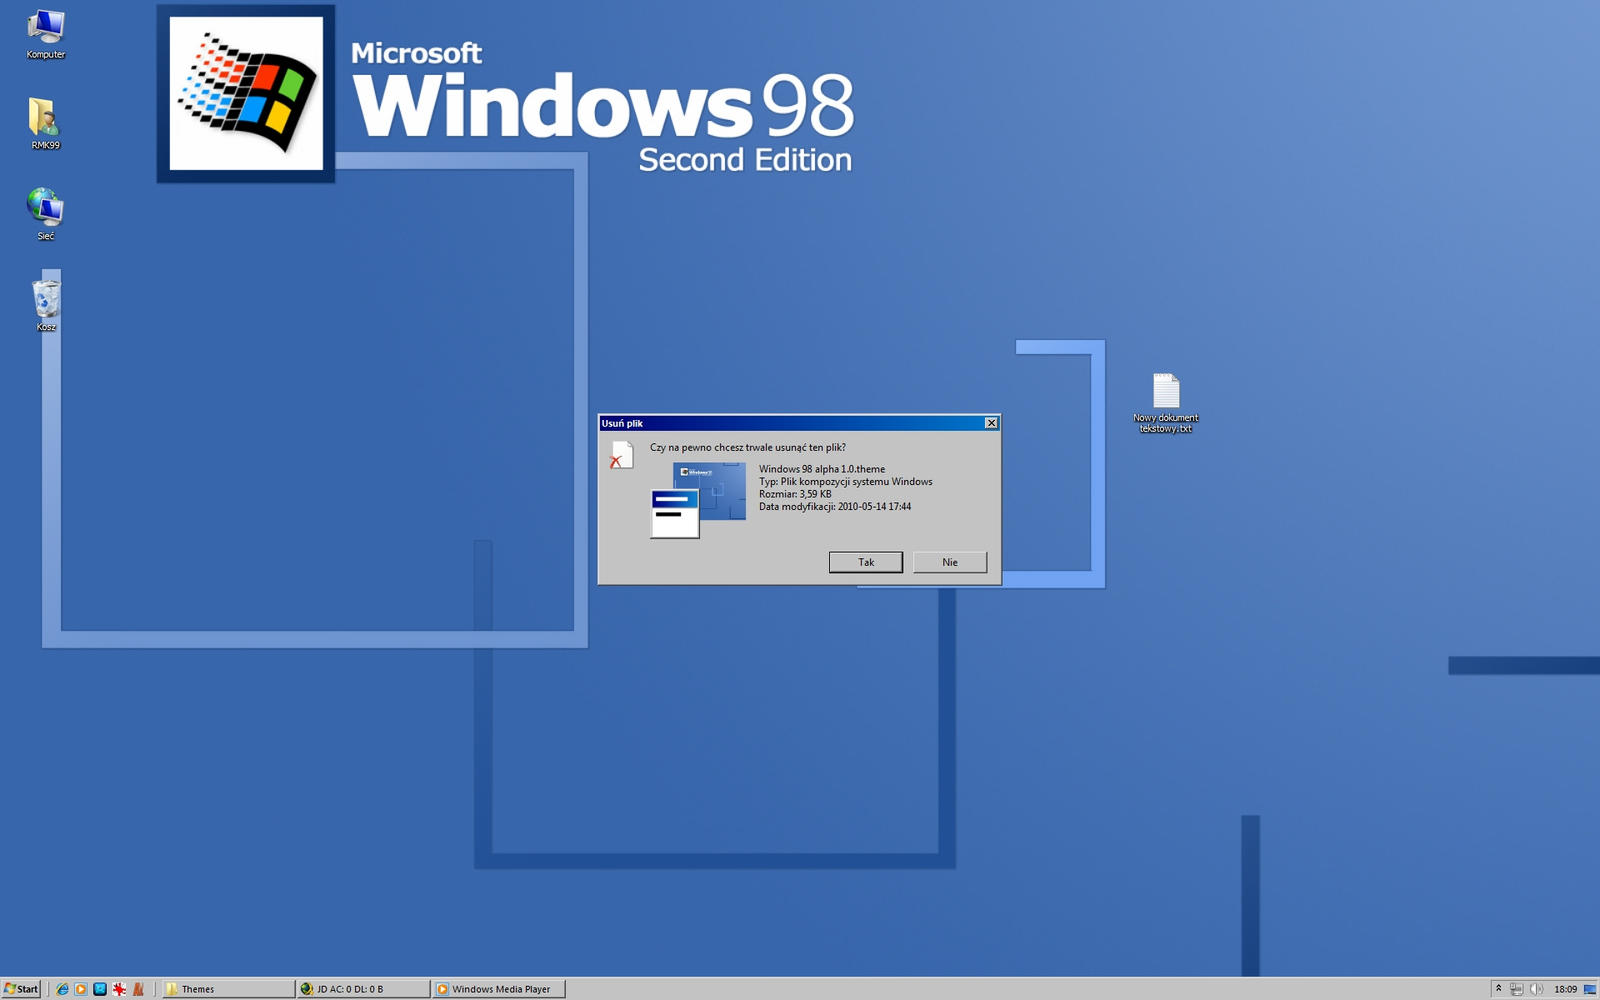 Windows 98 on windows 7 bing images for Windows windows windows